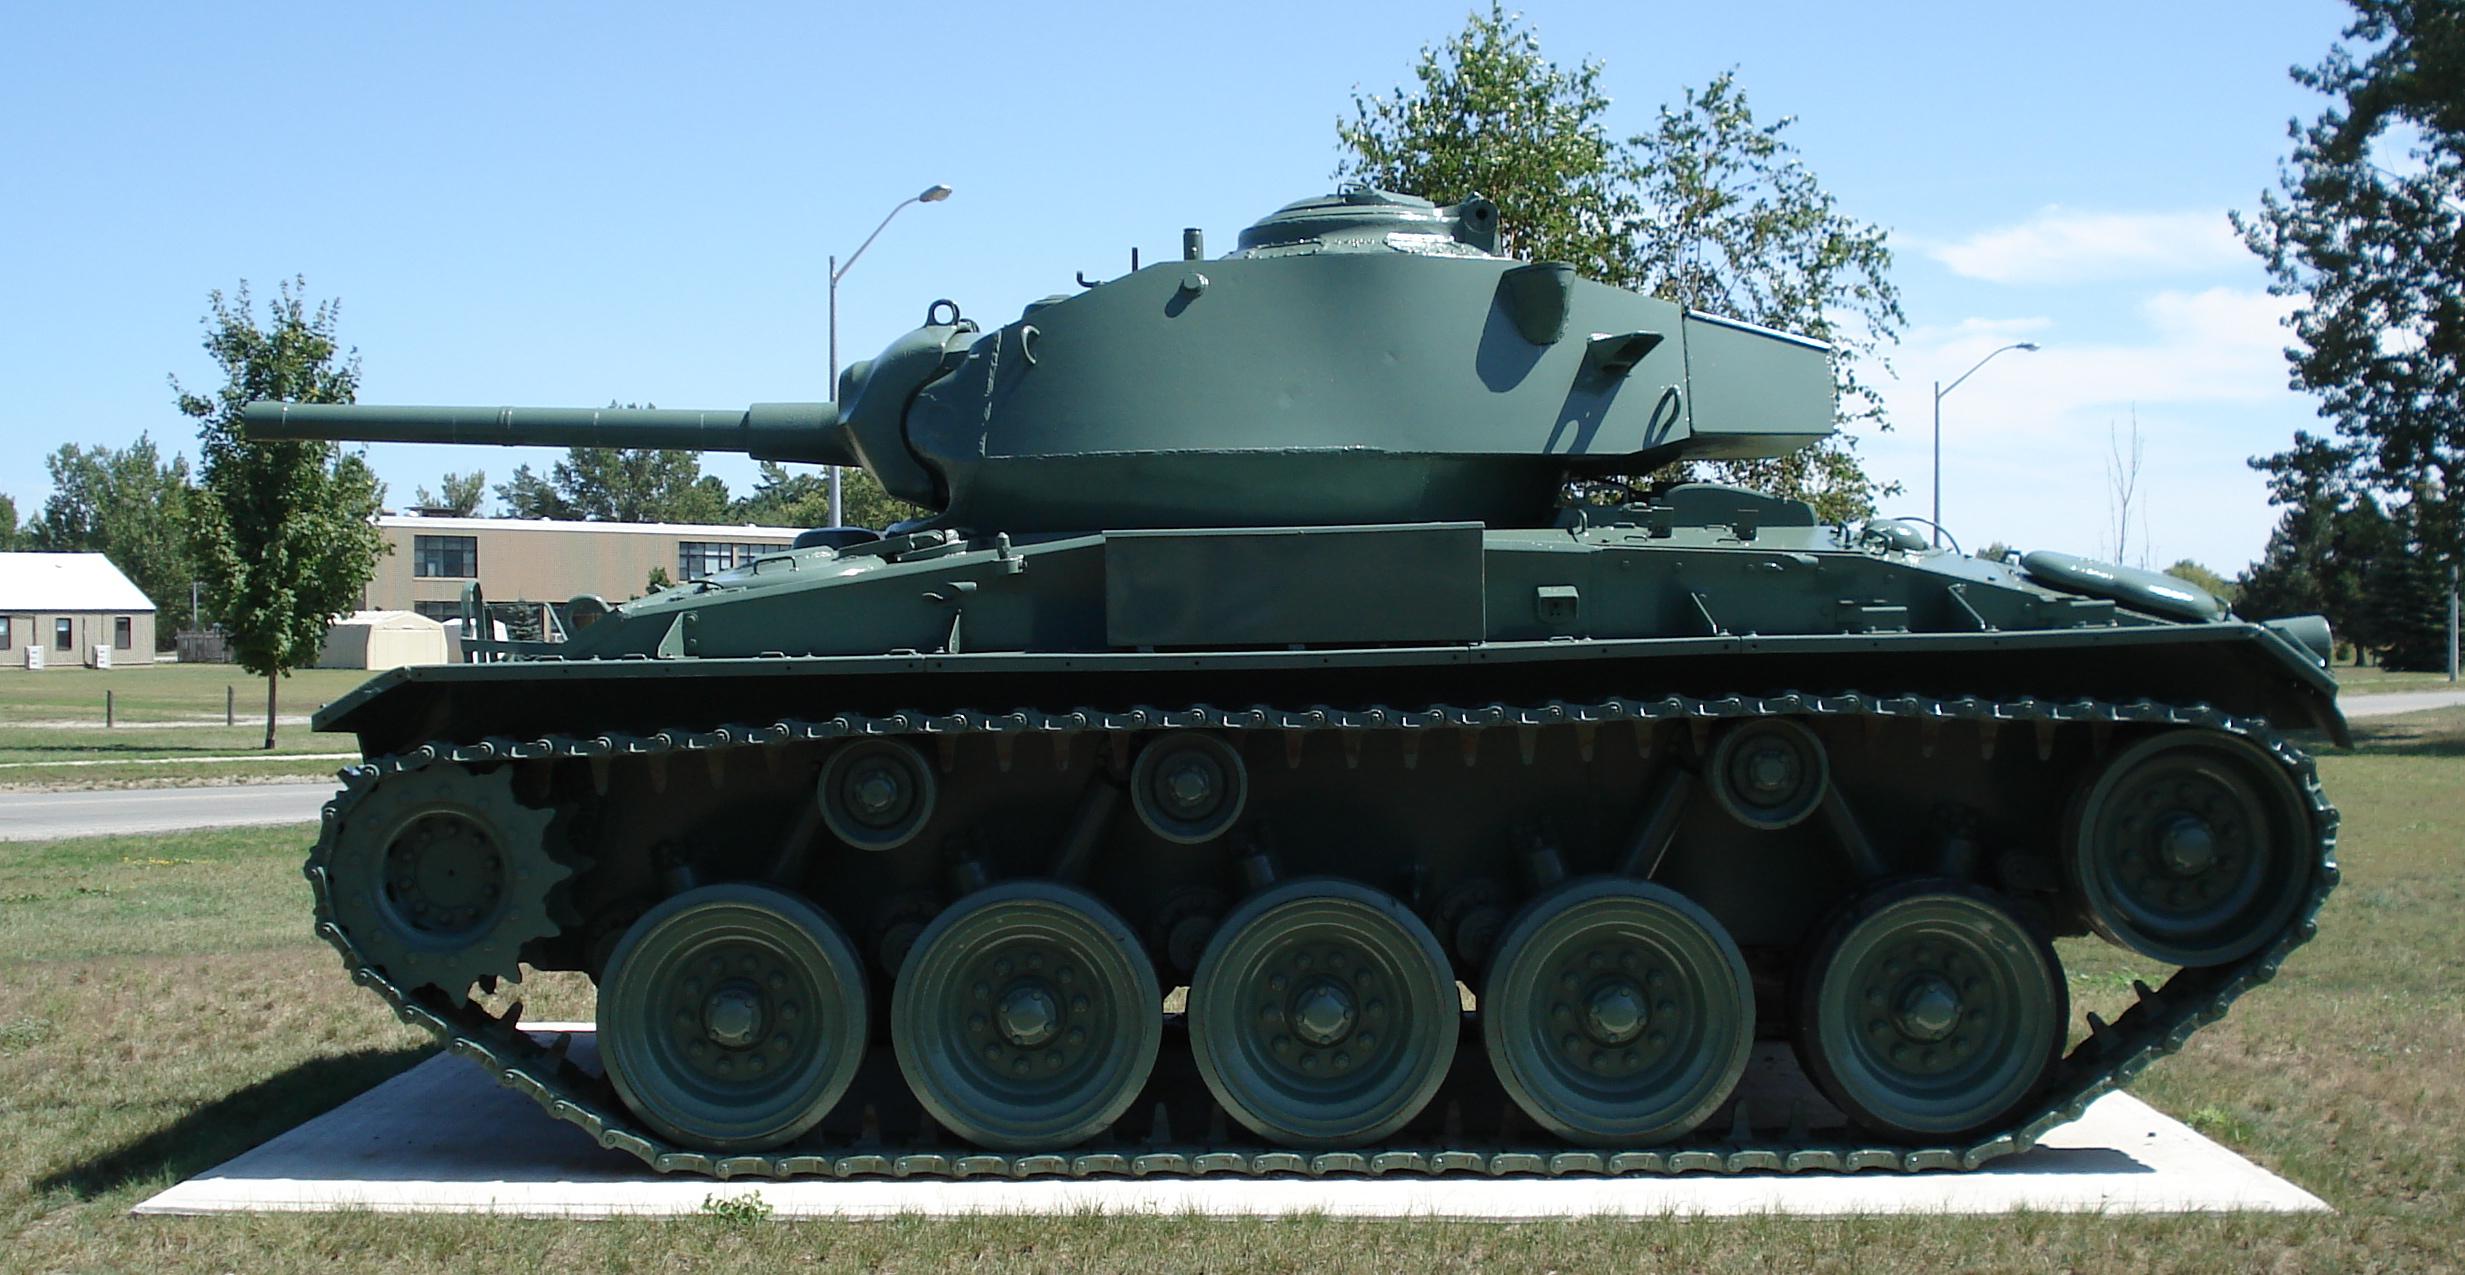 German 50 Mm Anti Tank Gun: File:Chaffee Light Tank Cfb Borden 3.jpg